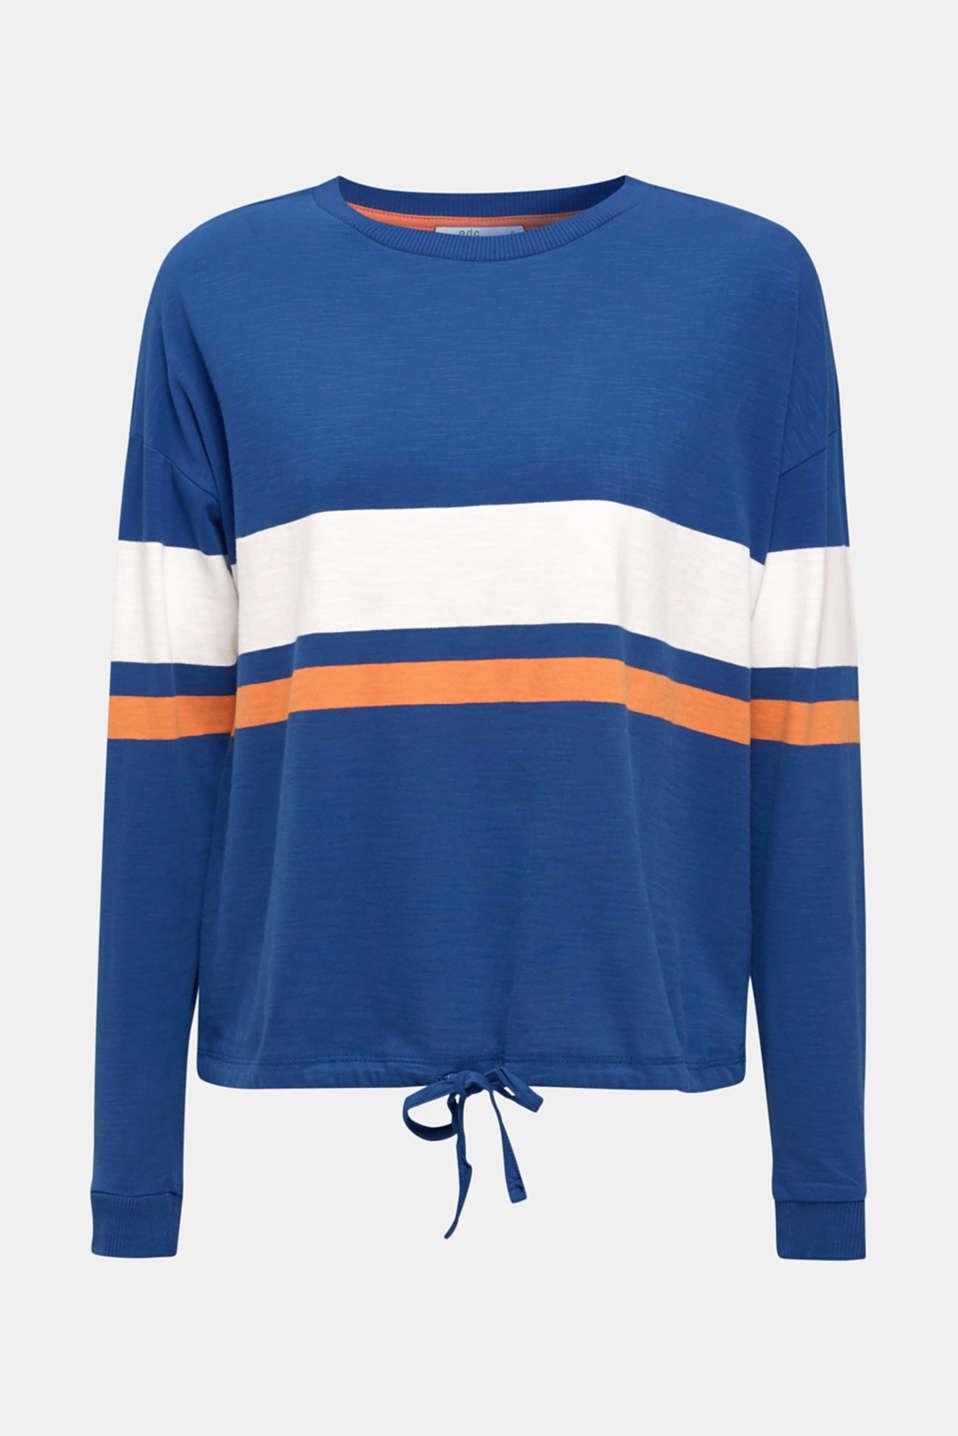 T-Shirts, DARK BLUE, detail image number 6